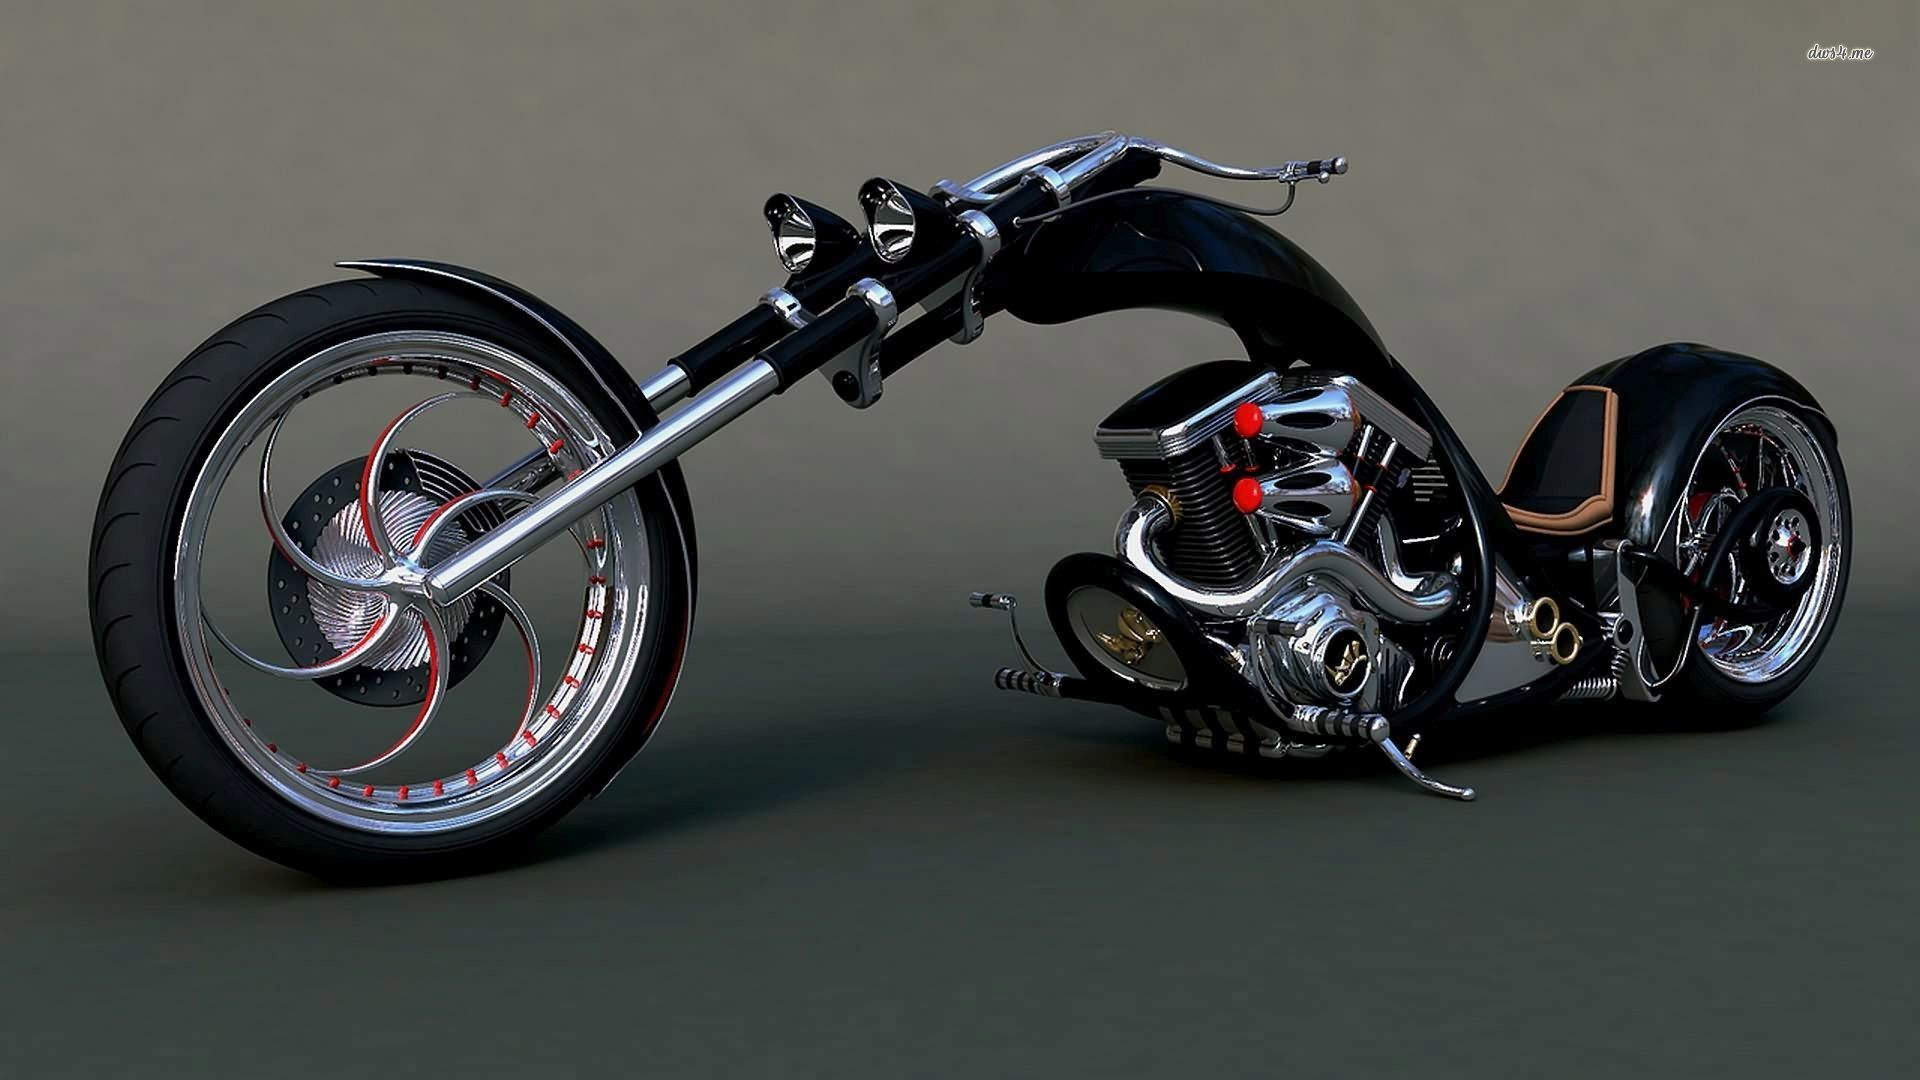 Image from https://cdn.desktopwallpapers4.me/wallpapers/motorcycles /1920×1080/3/29046-harley-chopper-1920×1080-motorcycle-wallpaper.jpg.